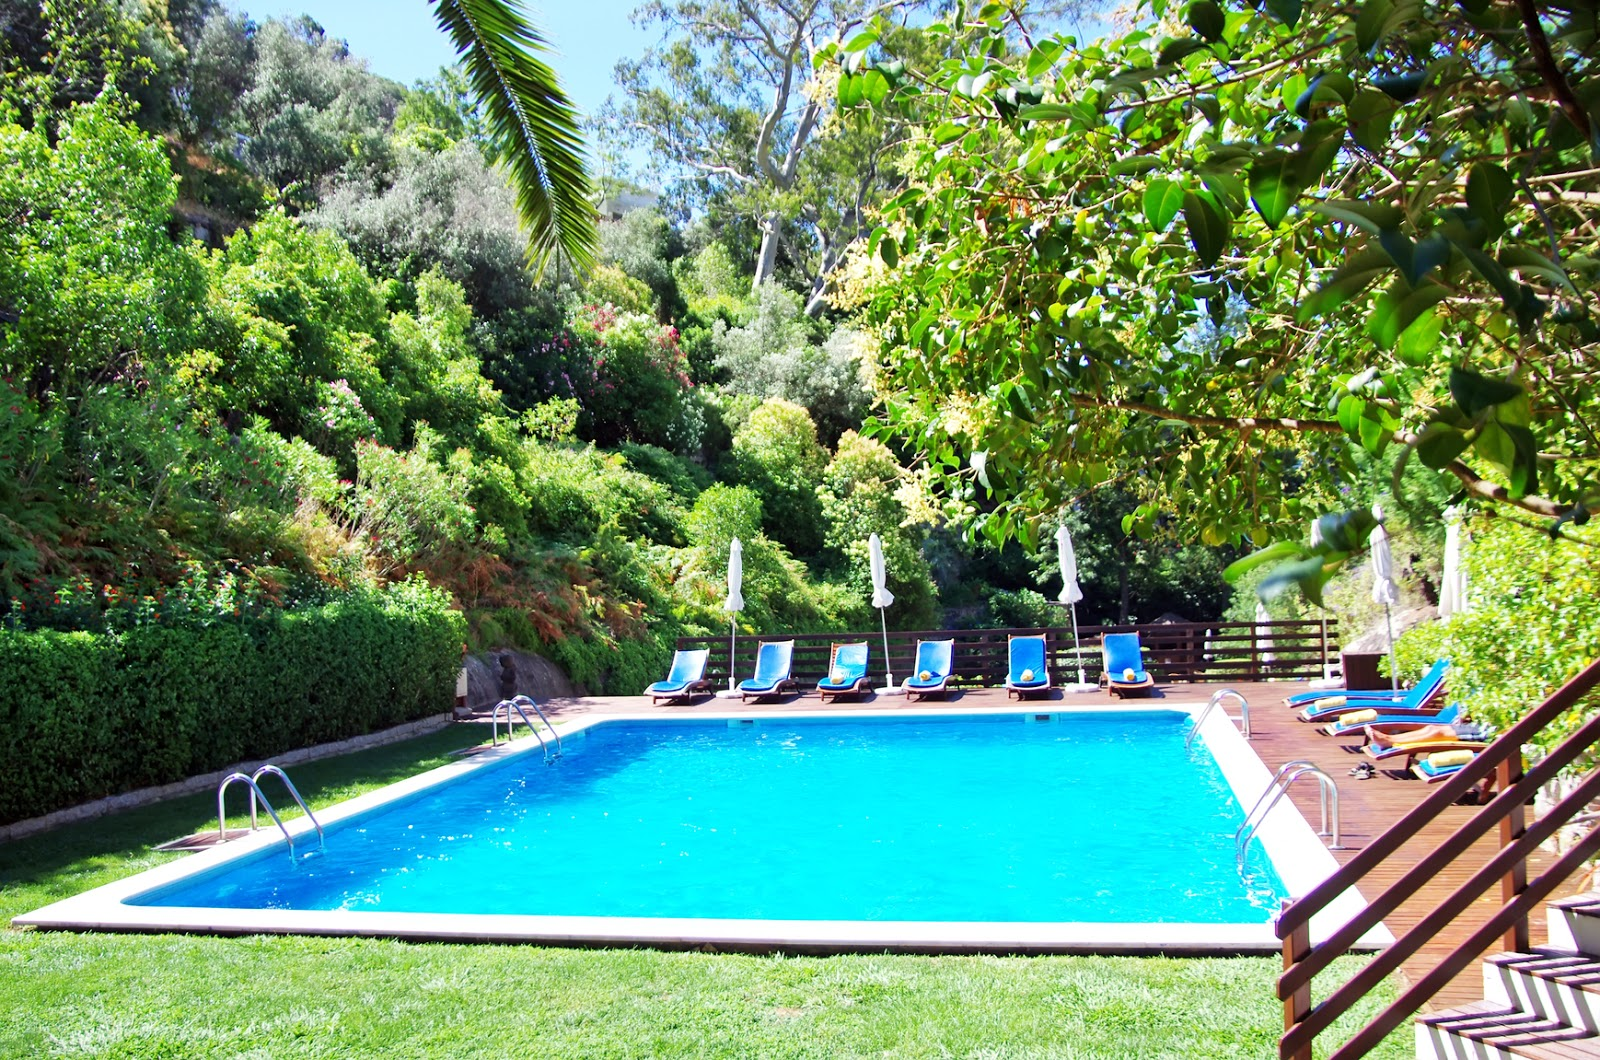 Banco de im genes piscina o alberca de agua azul con for Imagenes de piscinas